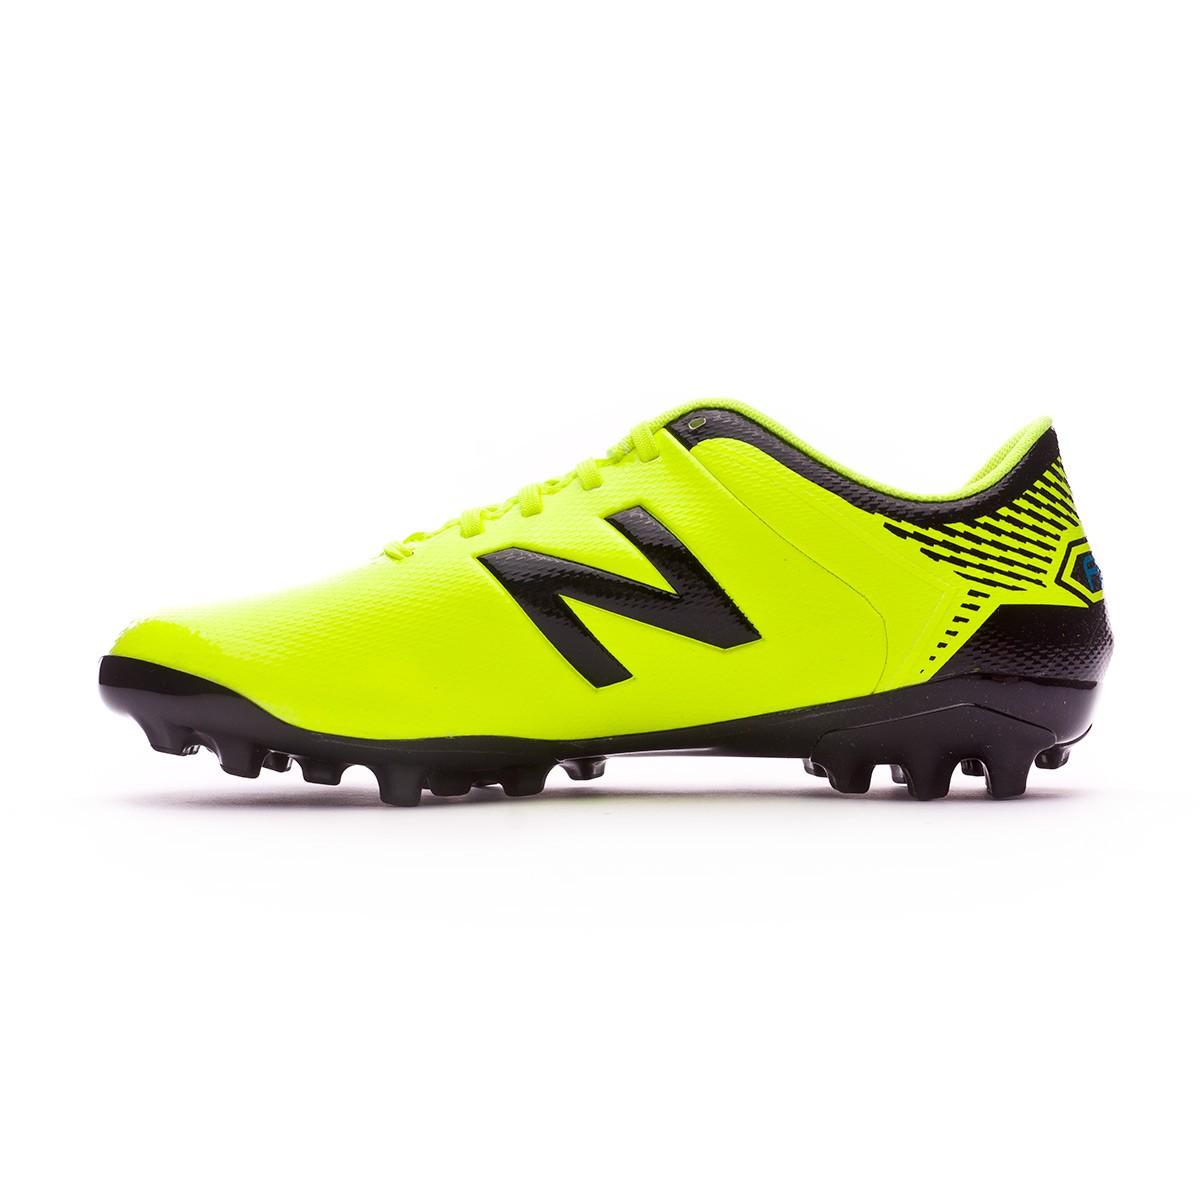 1118a67577c6f Football Boots New Balance Kids Furon Dispatch AG Amarillo Fluor-Blue -  Tienda de fútbol Fútbol Emotion